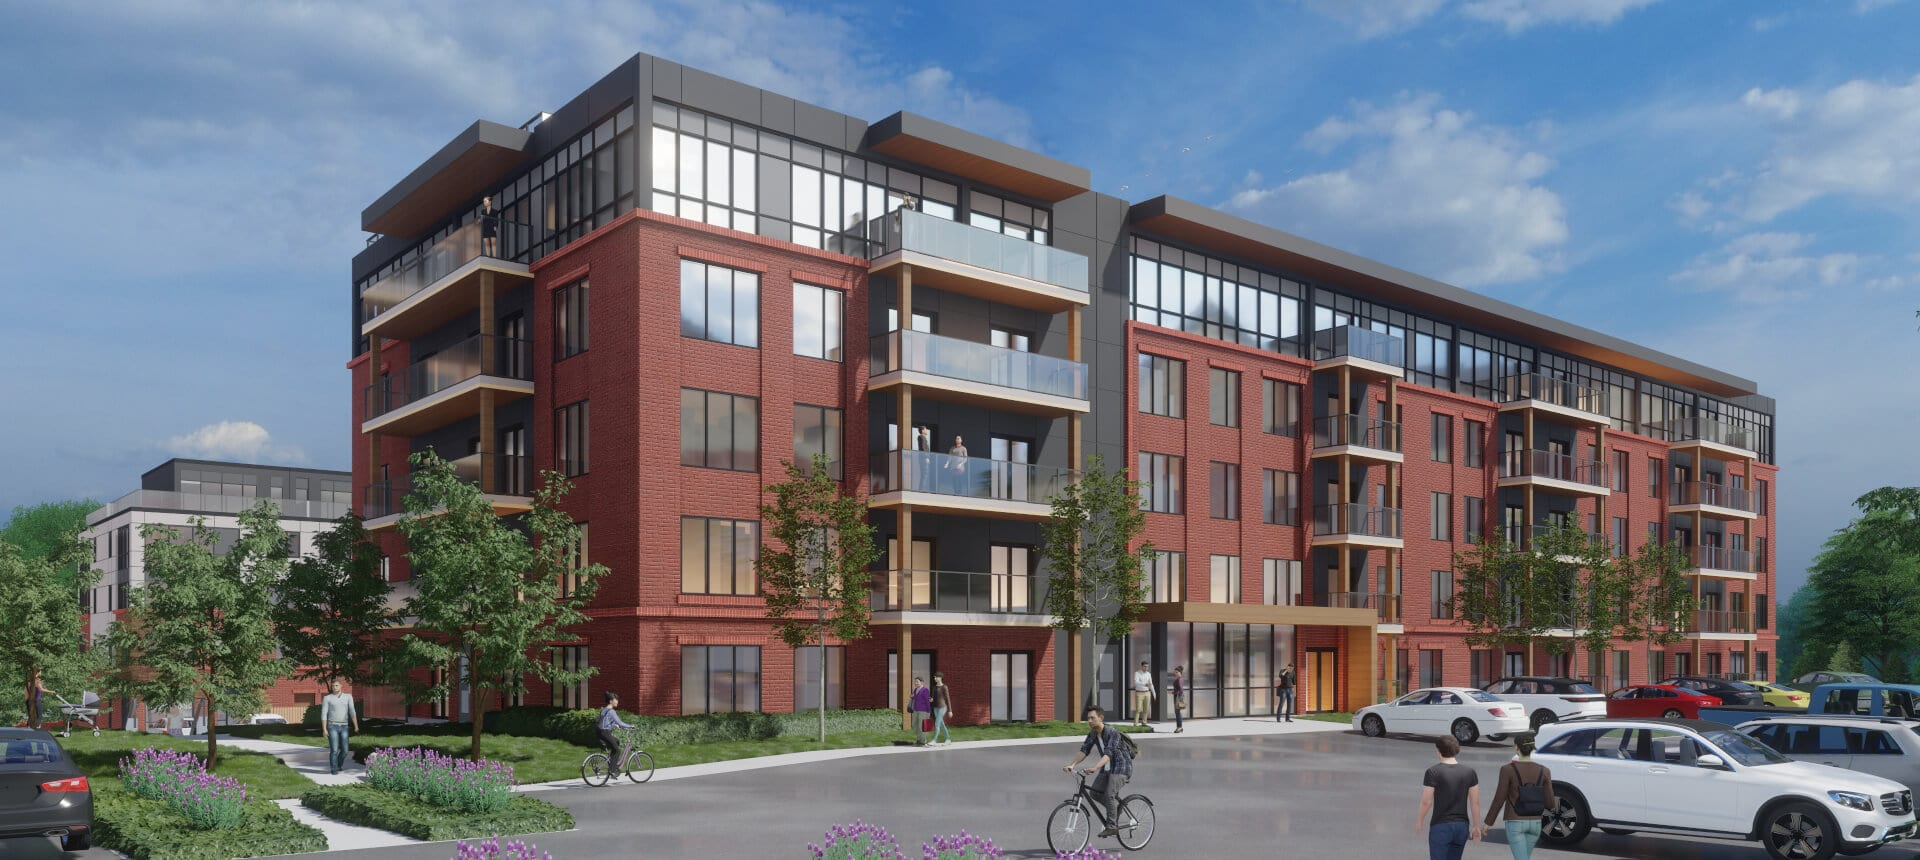 SkyDev Development Meaford - Building-Rendering